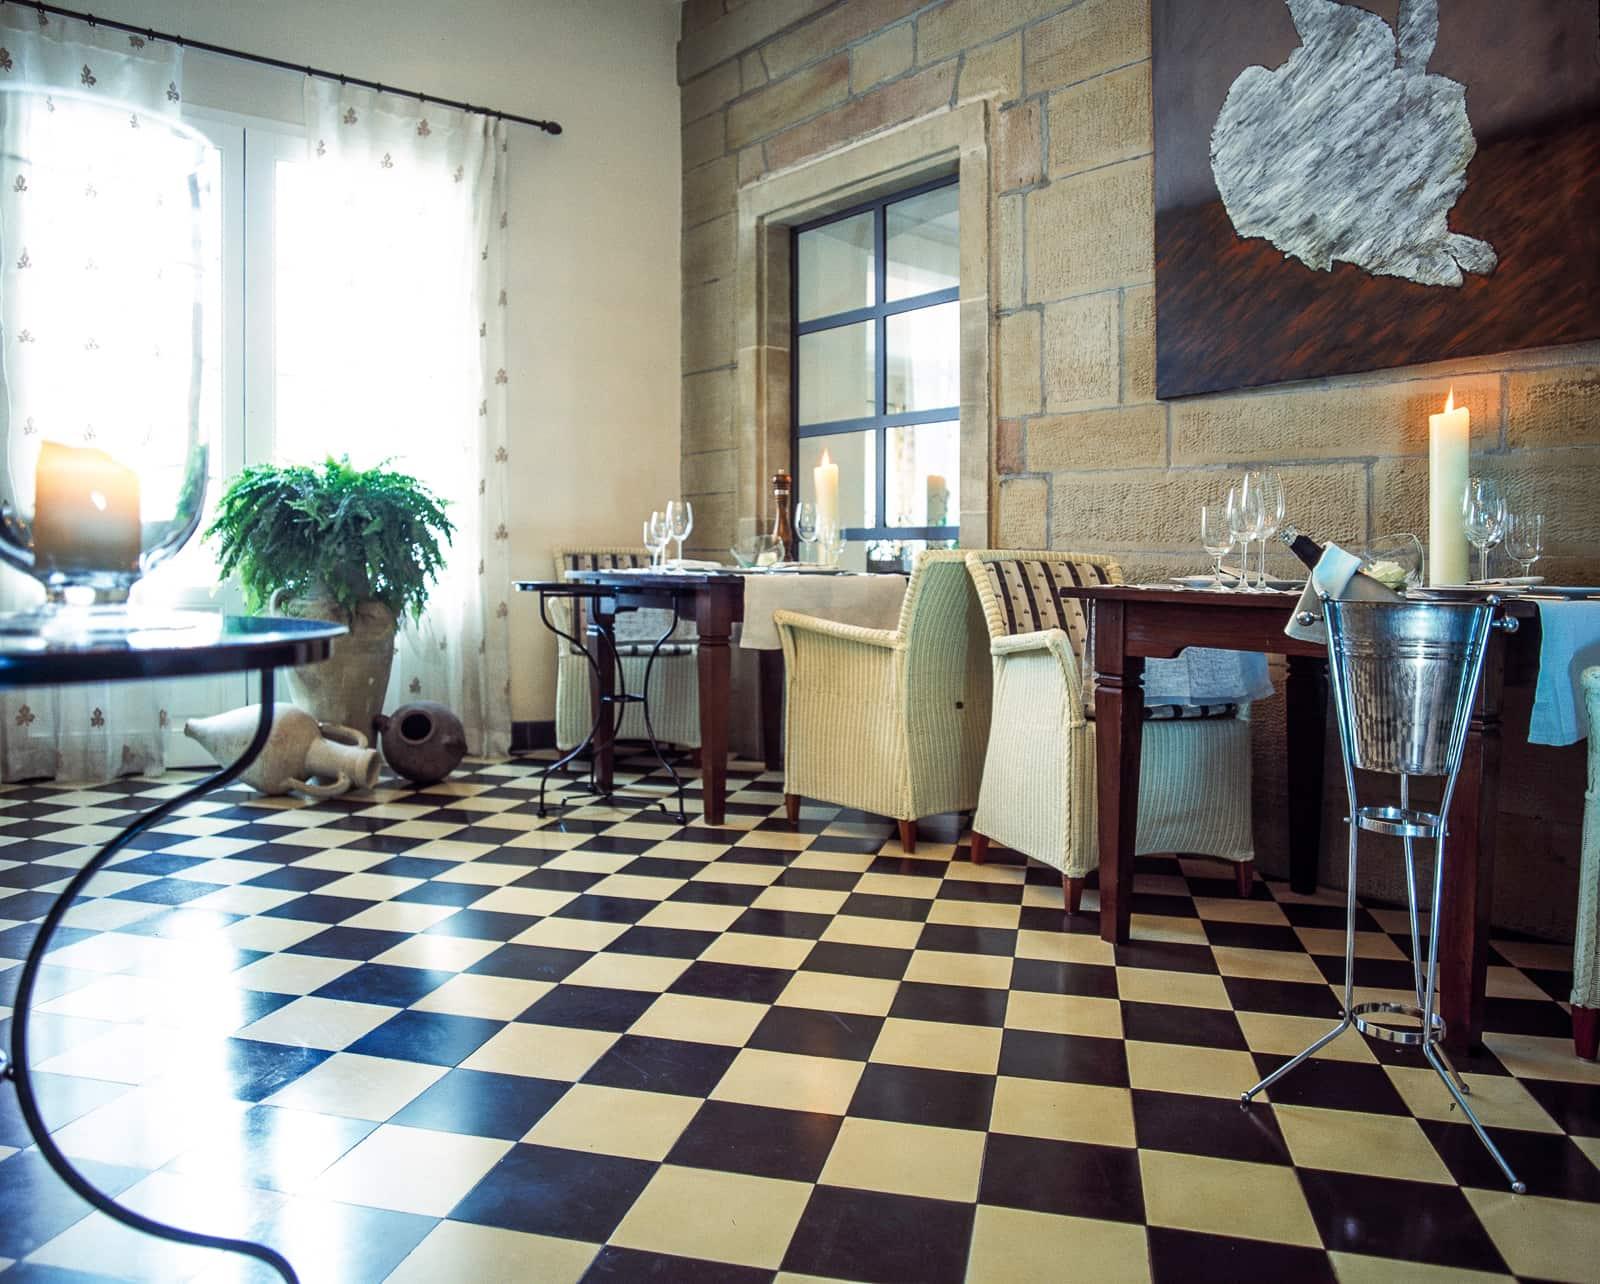 zementfliesen-terrazzofliesen-kreidefarbe-terrazzo-fugenlos-viaplatten-11-60-hotel   11